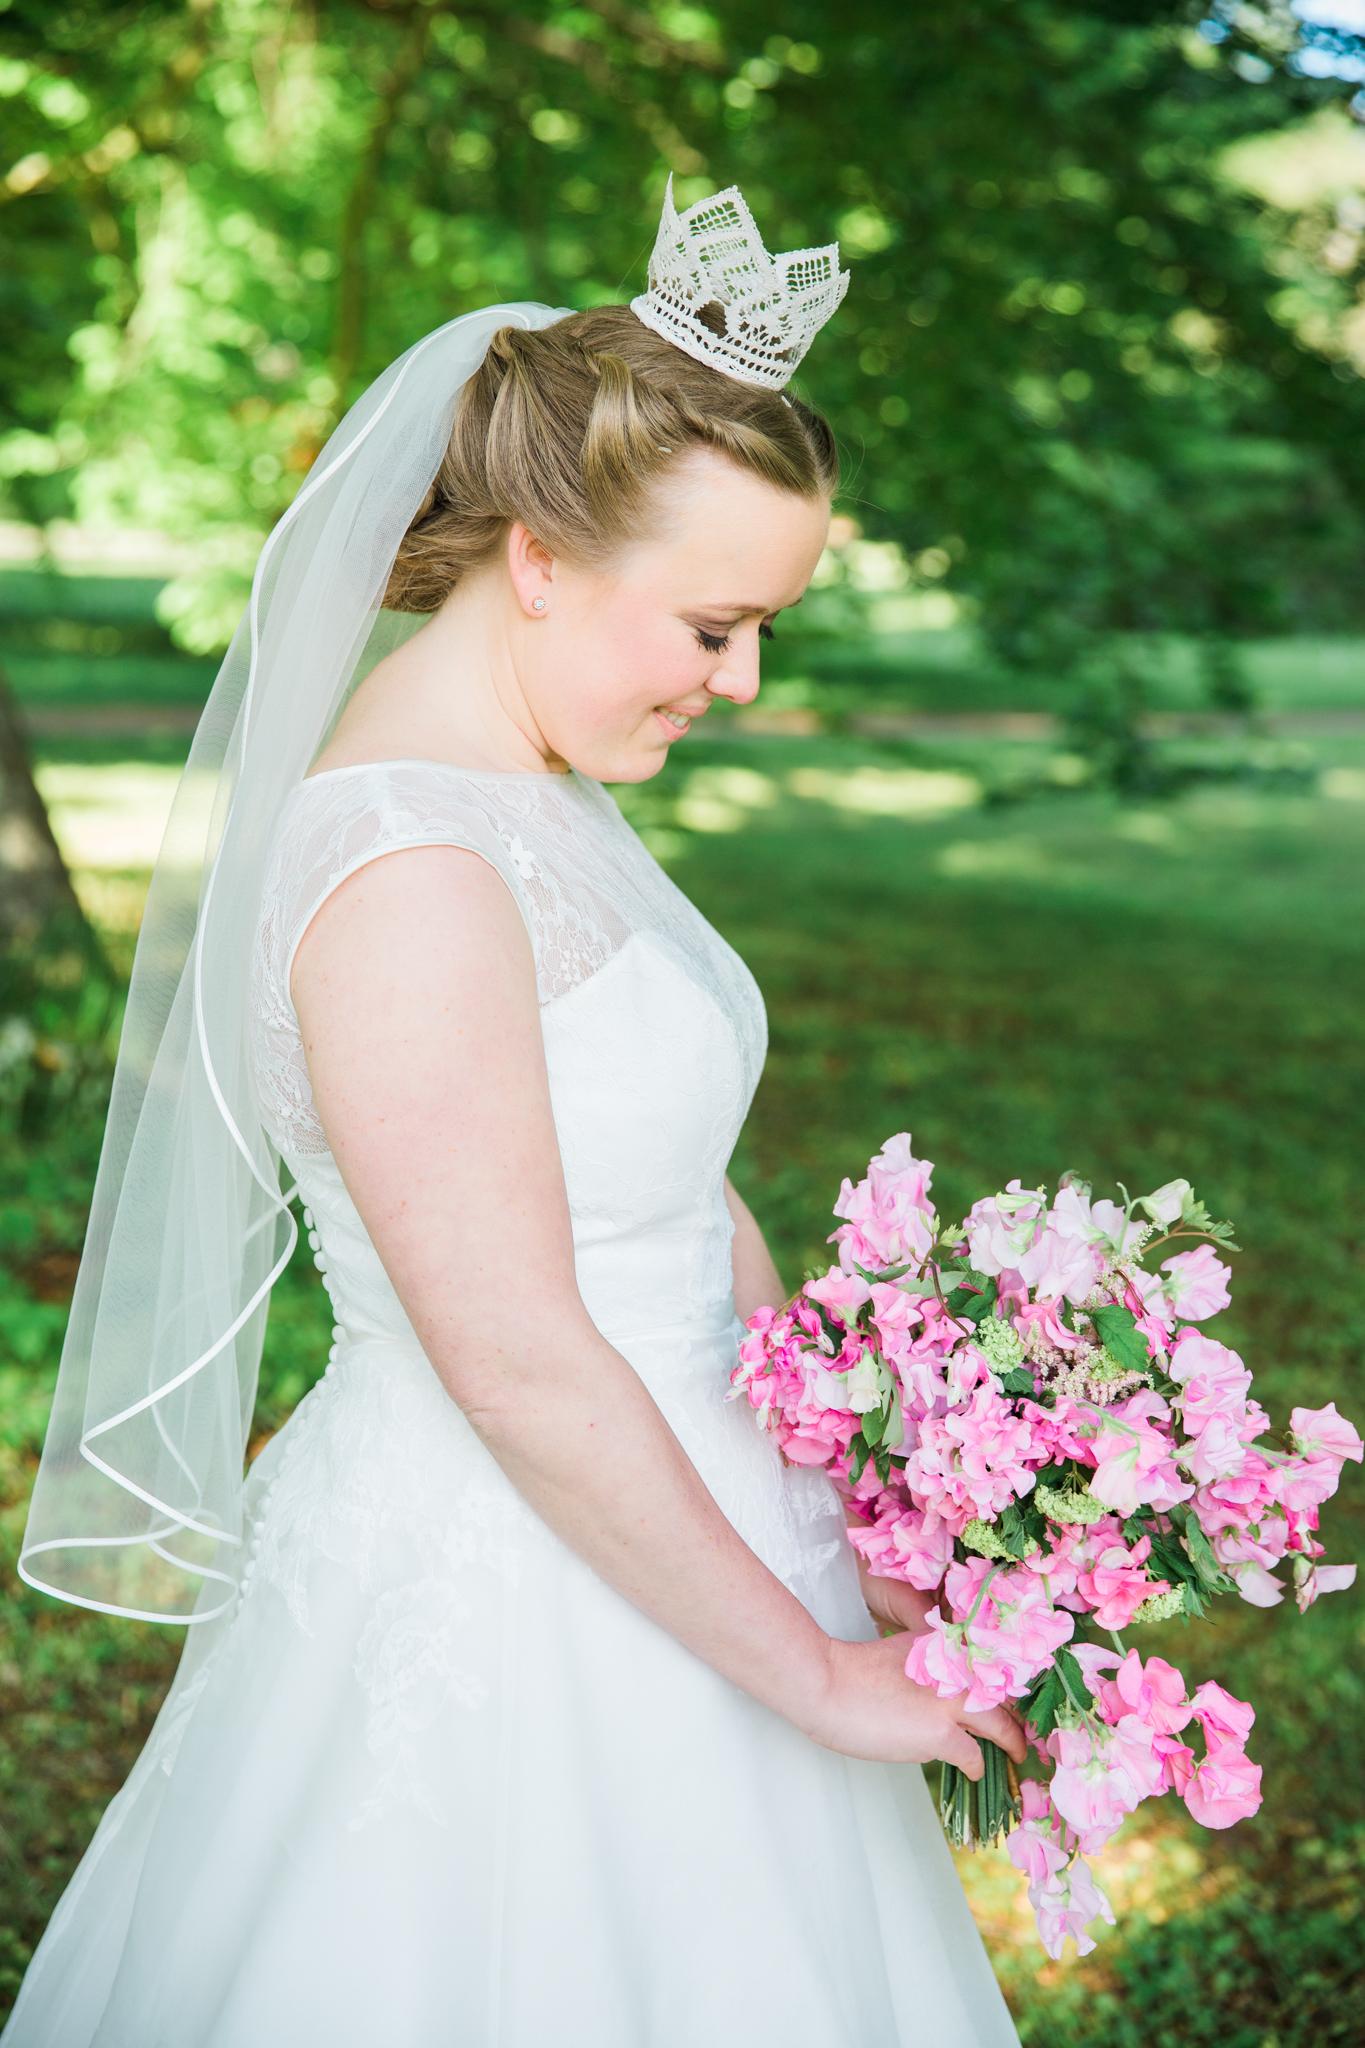 ViOli Photography bröllopsfotograf-Karlshamn-Blekinge-Ronneby-Karlskrona-Sölvesborg-Bromölla-Kristianstad (31 av 35)